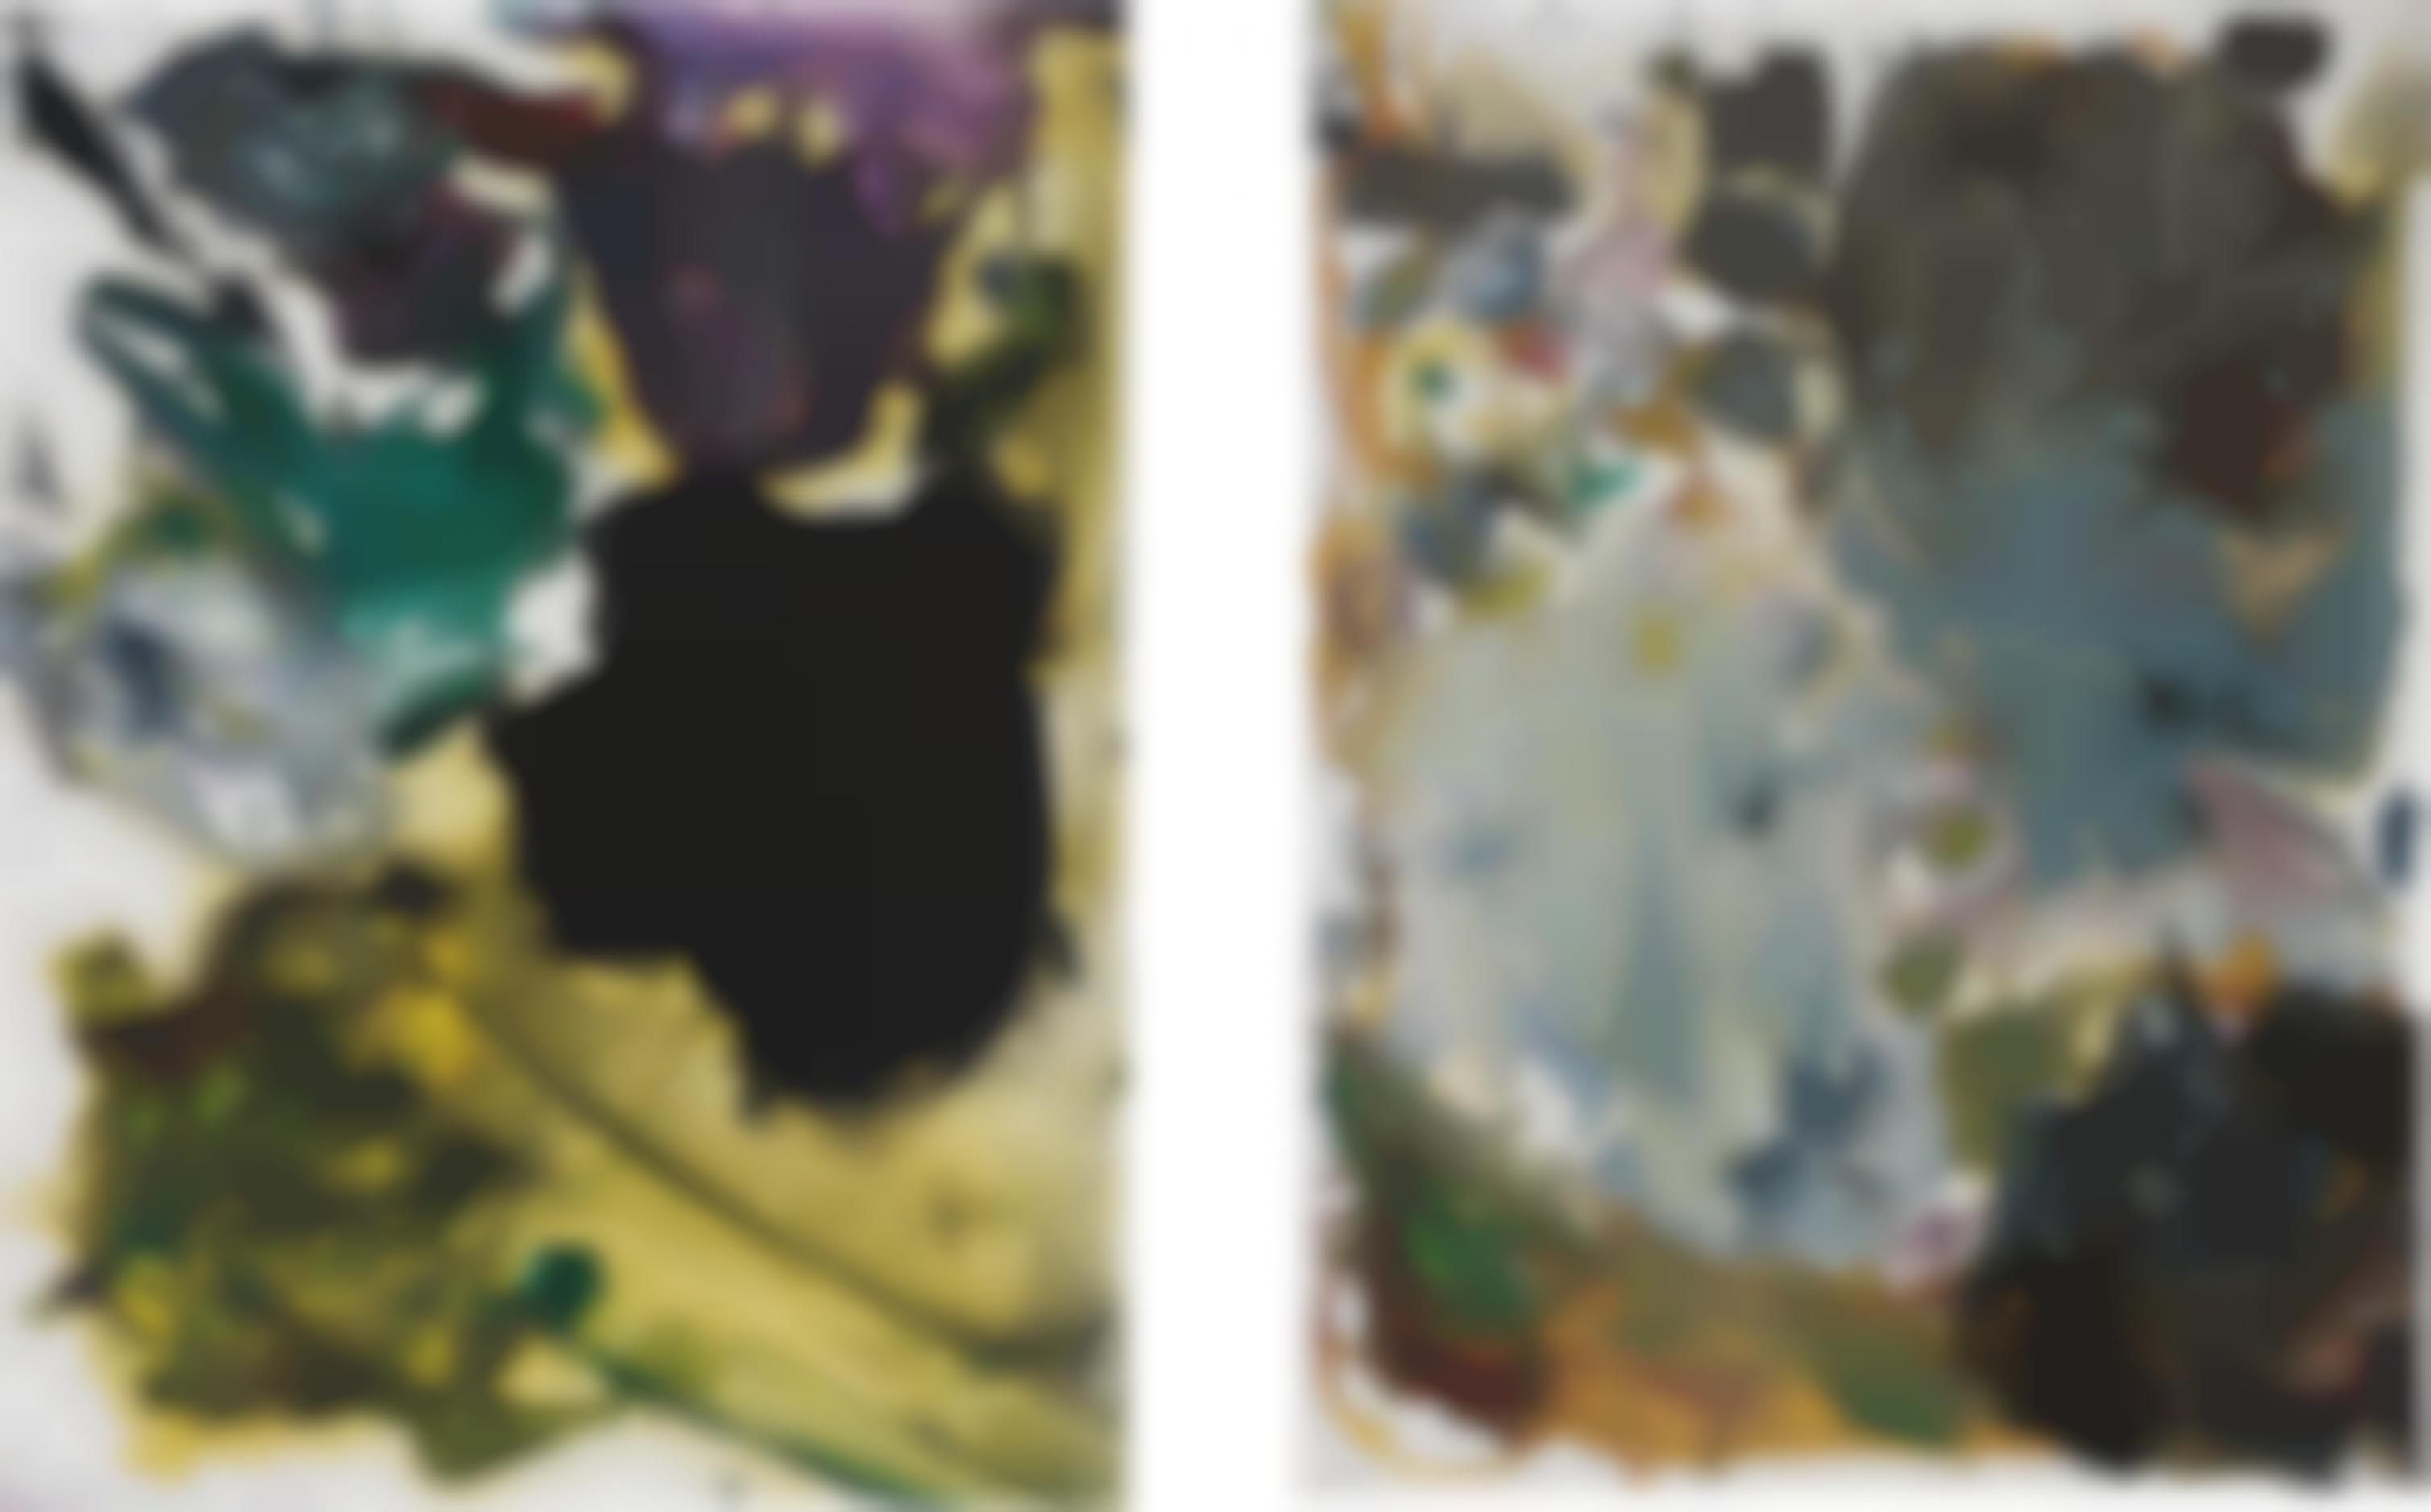 Josh Smith-Two Works: (i) Untitled (ii) Untitled-2006